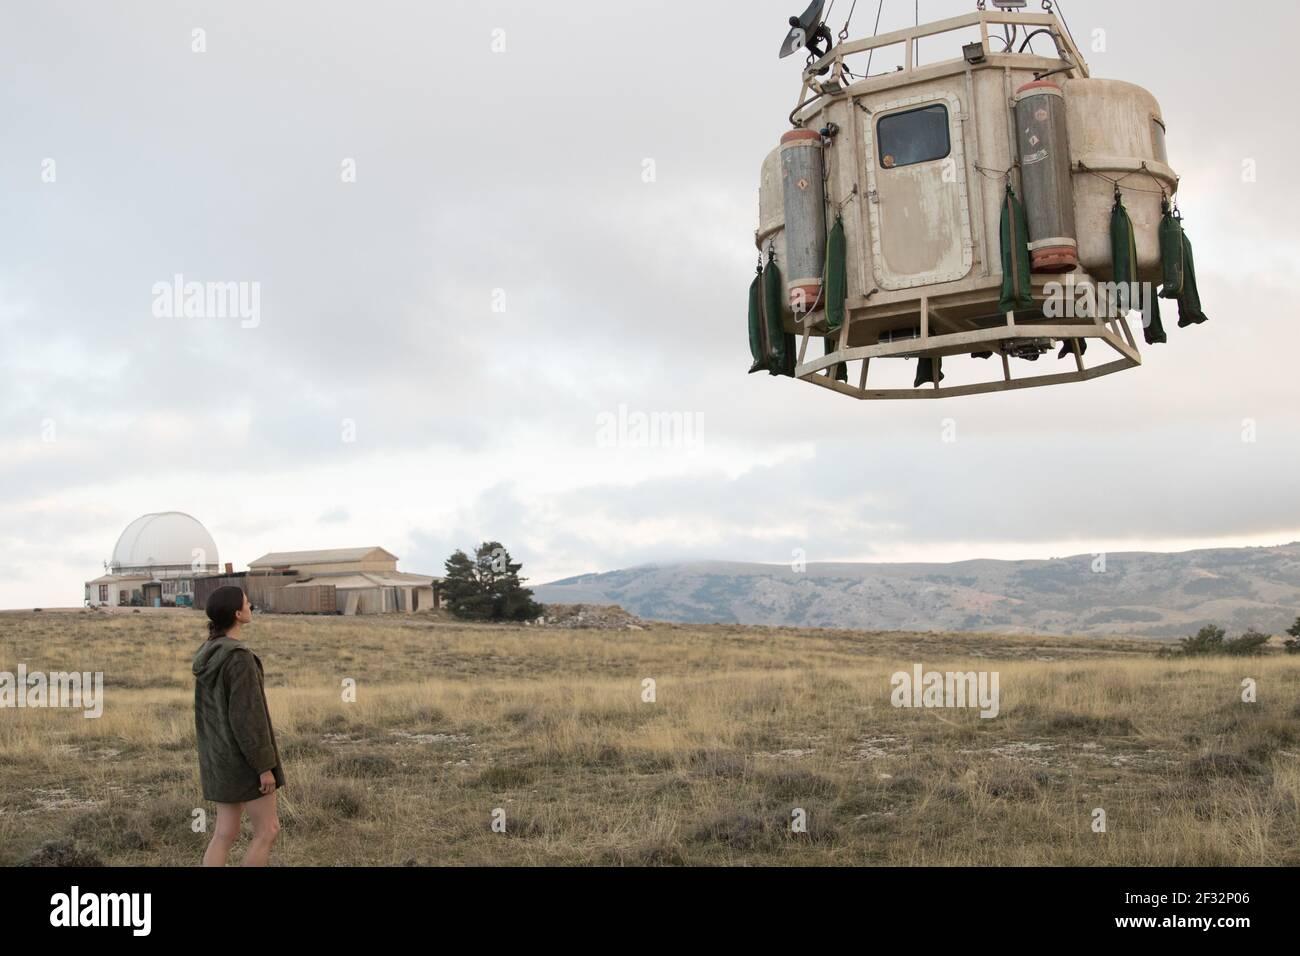 MARGARET QUALLEY, IO, 2019, ©WILLIAM GRAY/NETFLIX Banque D'Images